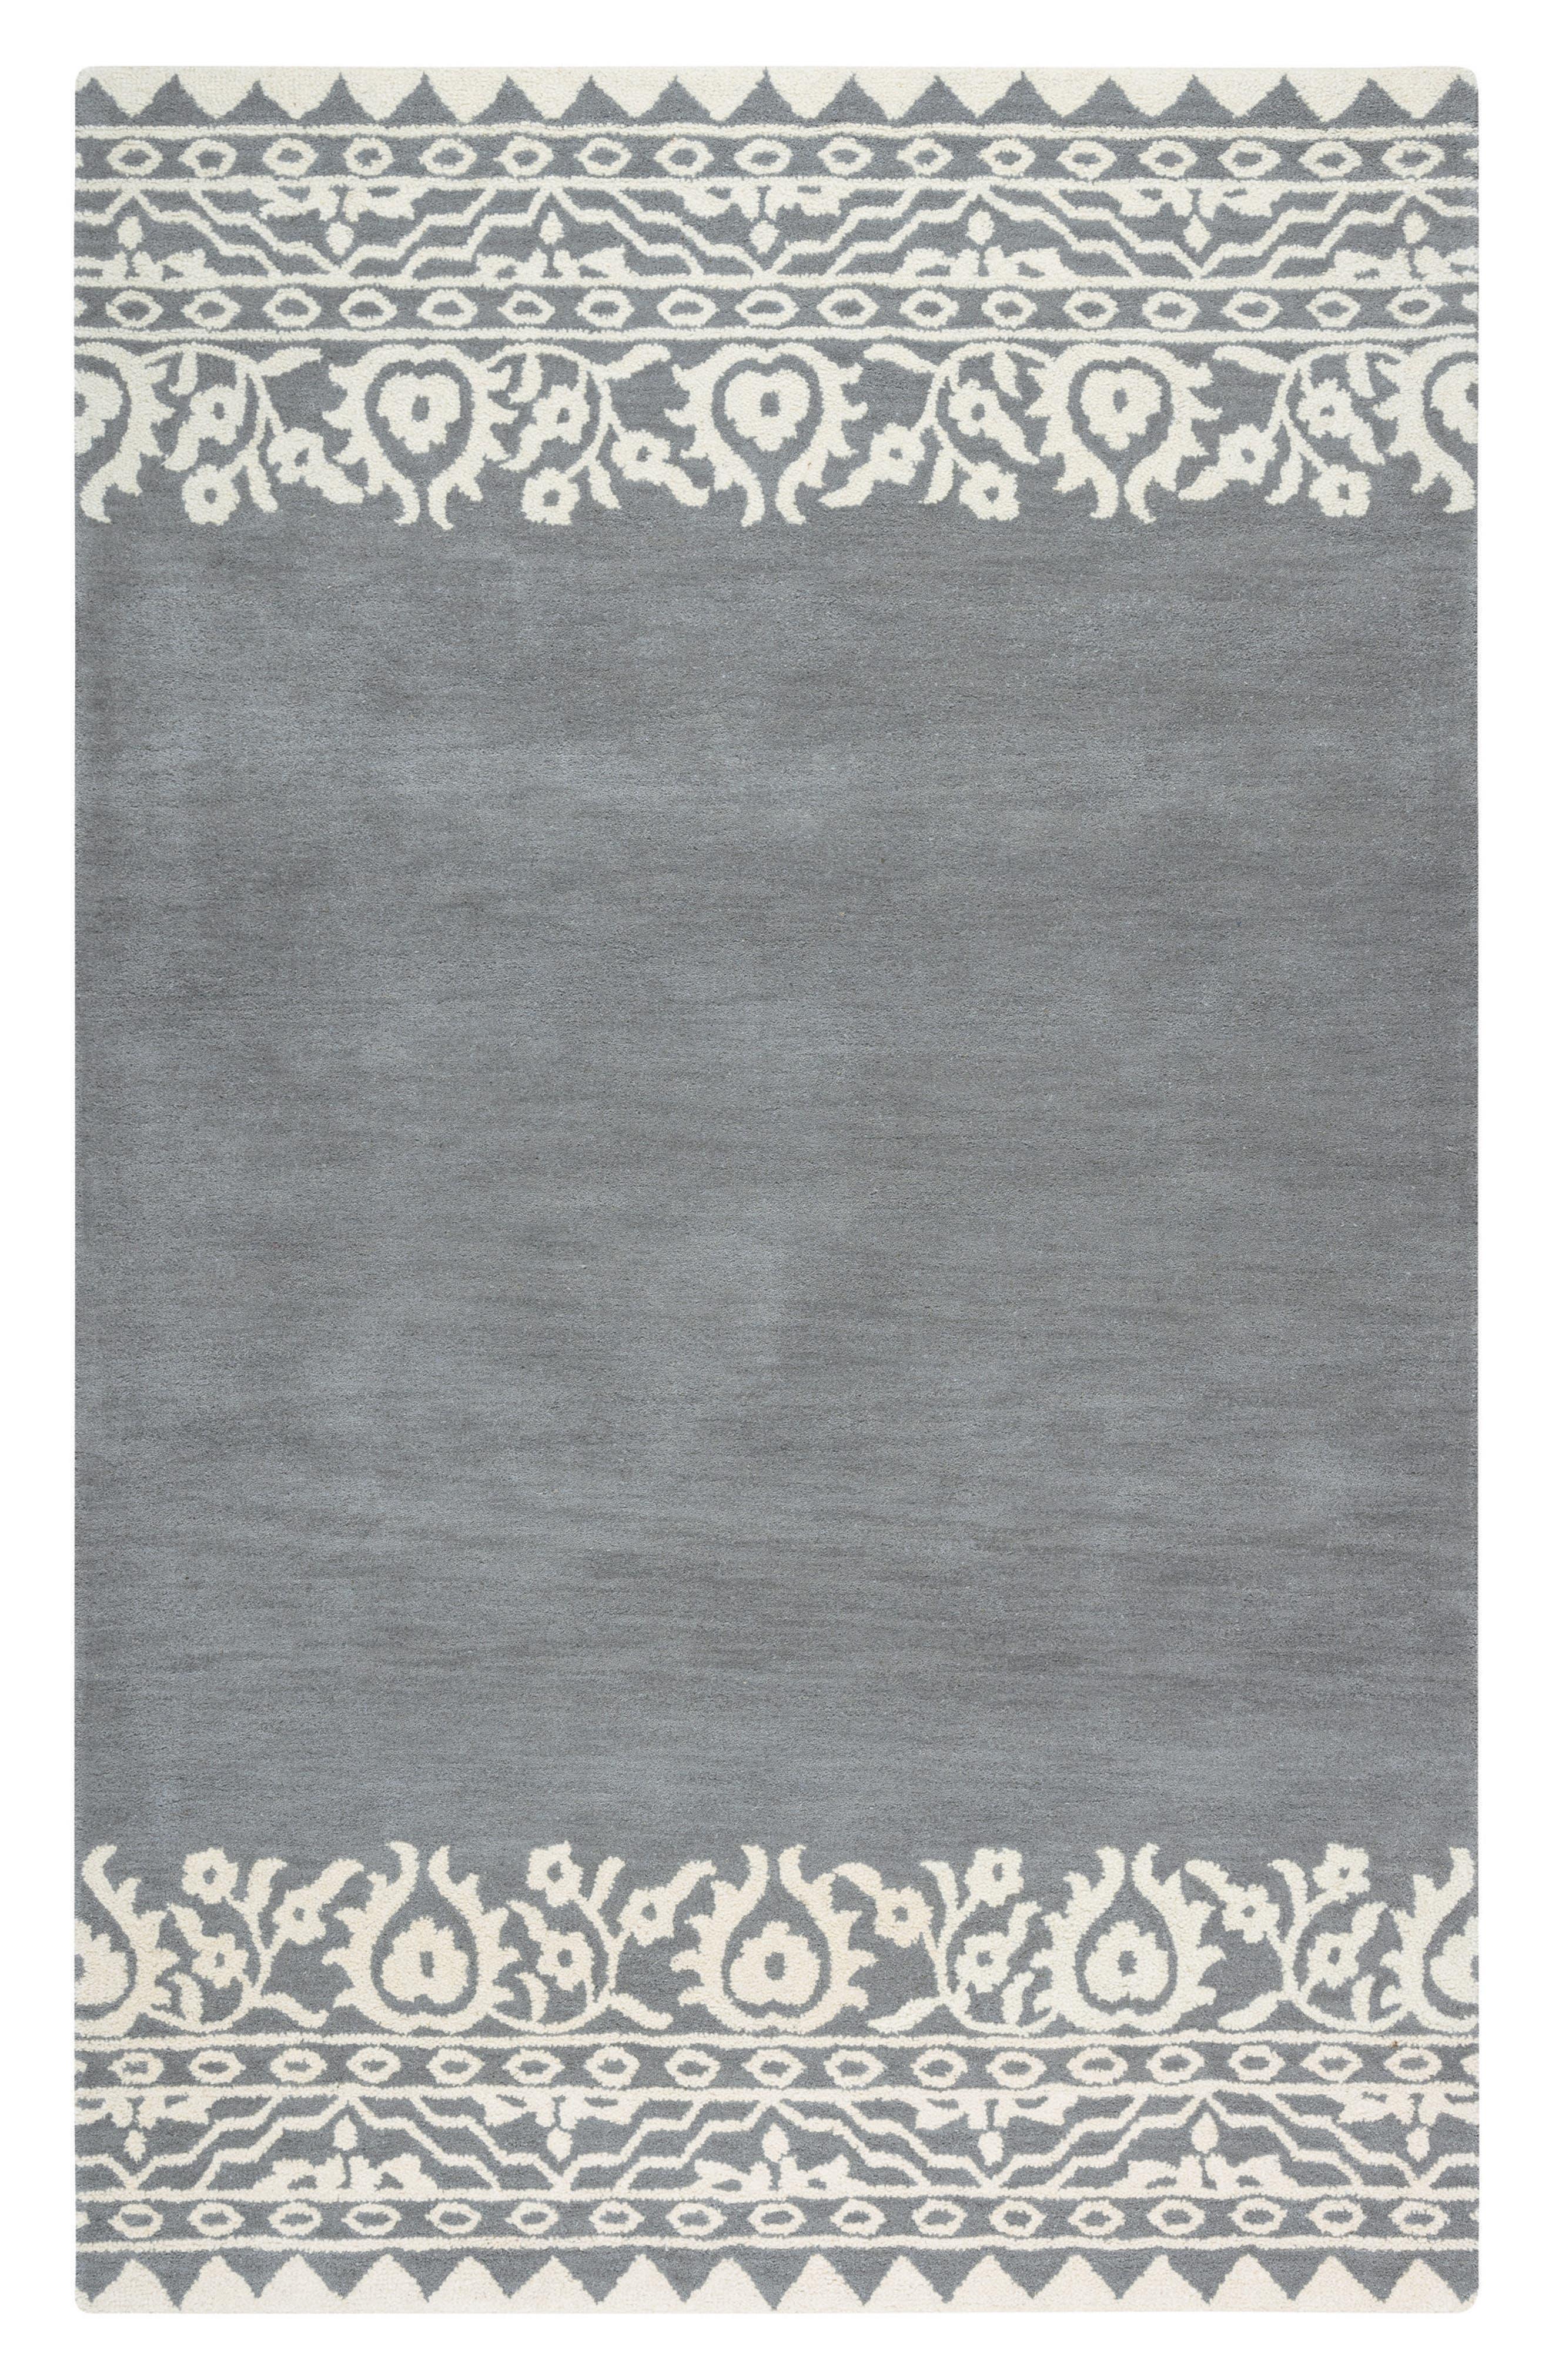 Framed Medallion Hand Tufted Wool Area Rug,                             Main thumbnail 2, color,